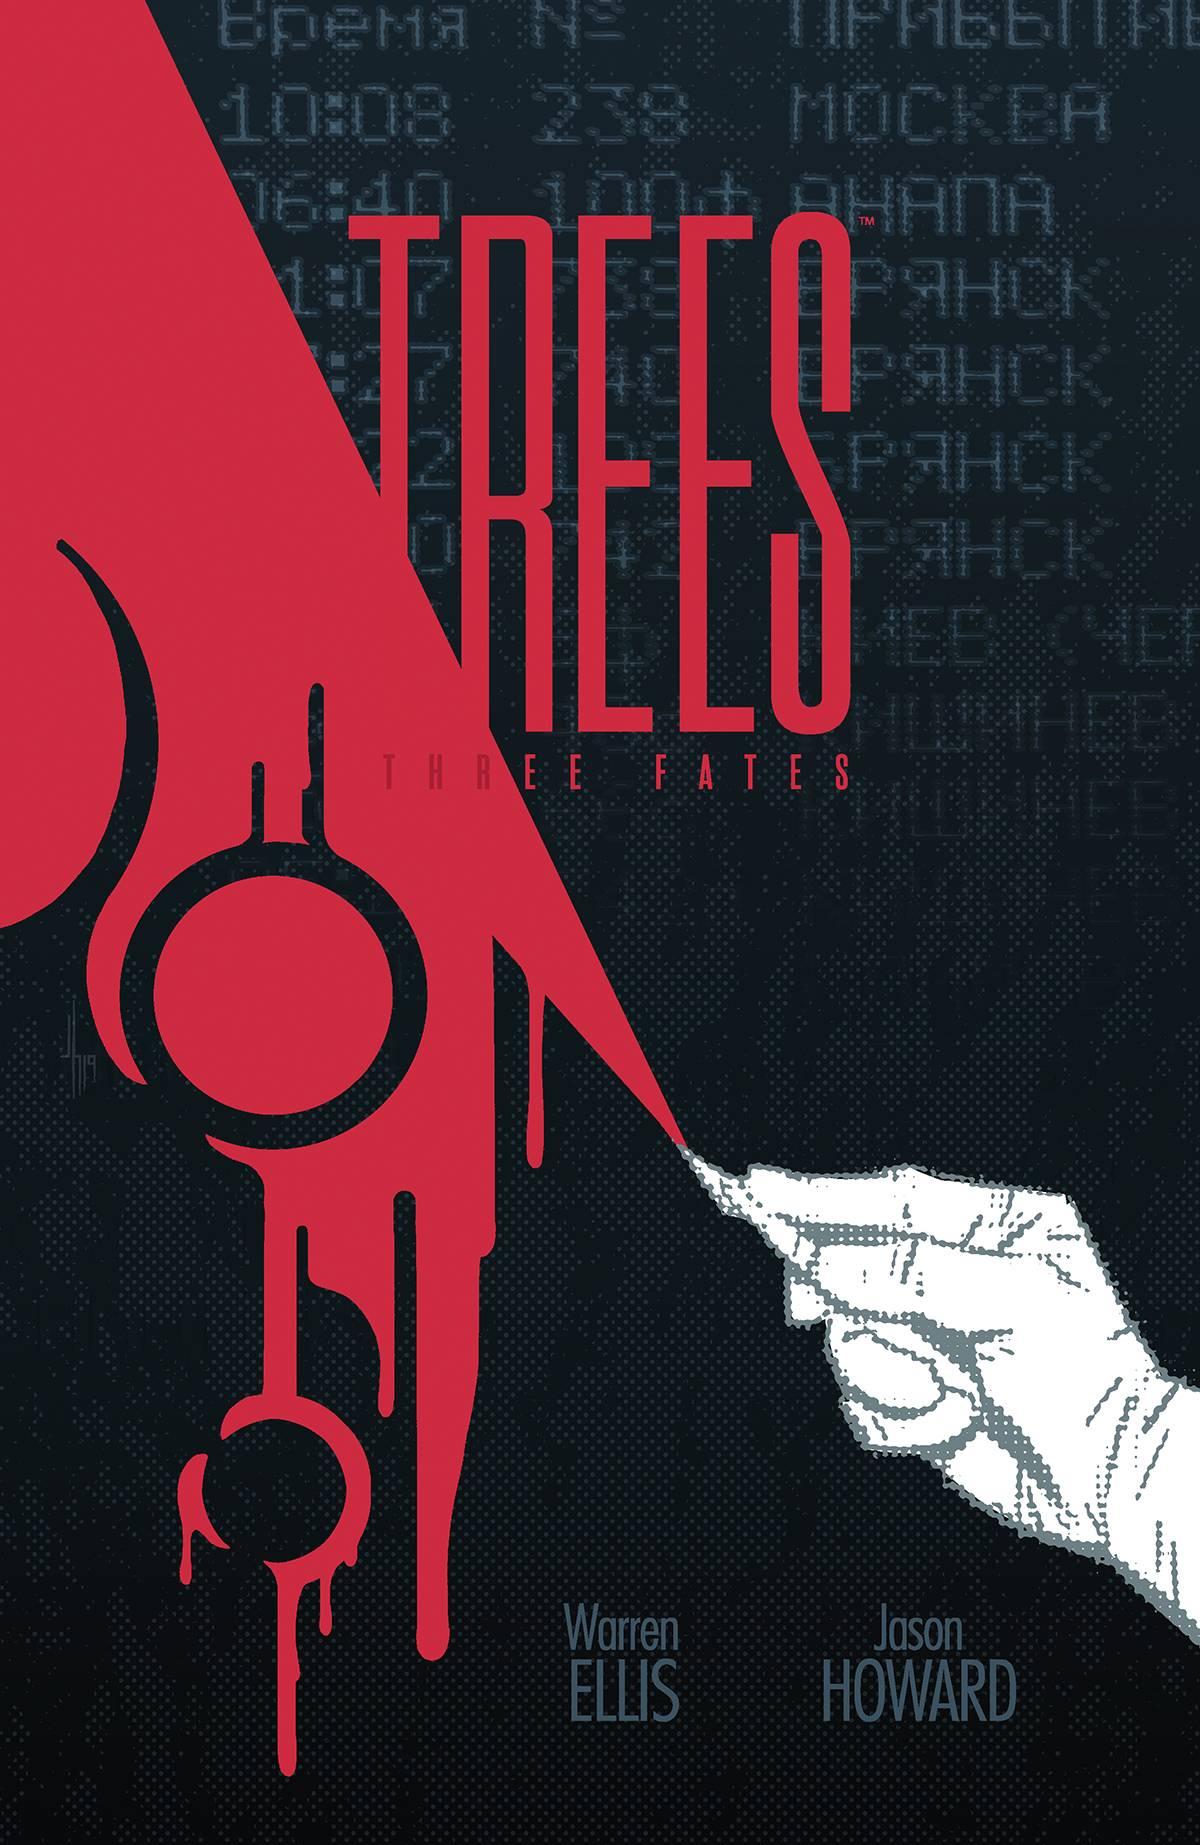 Trees: Three Fates #3 (2019)